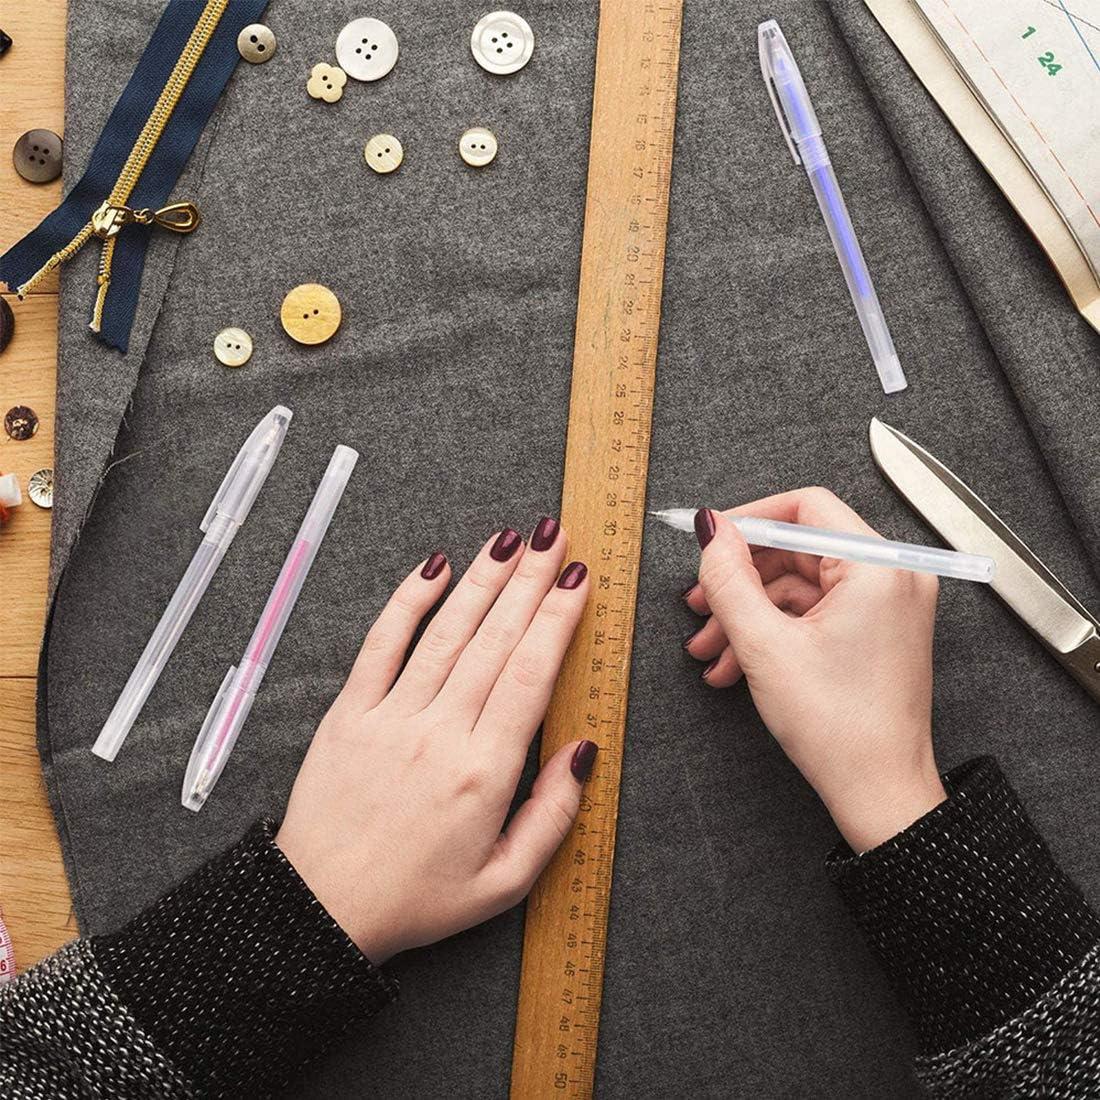 16 penne cancellabili per marcatura Ruiyiqi 4 colori trapuntatura e sartoria include 12 ricariche per penne per cucito penne cancellabili a caldo